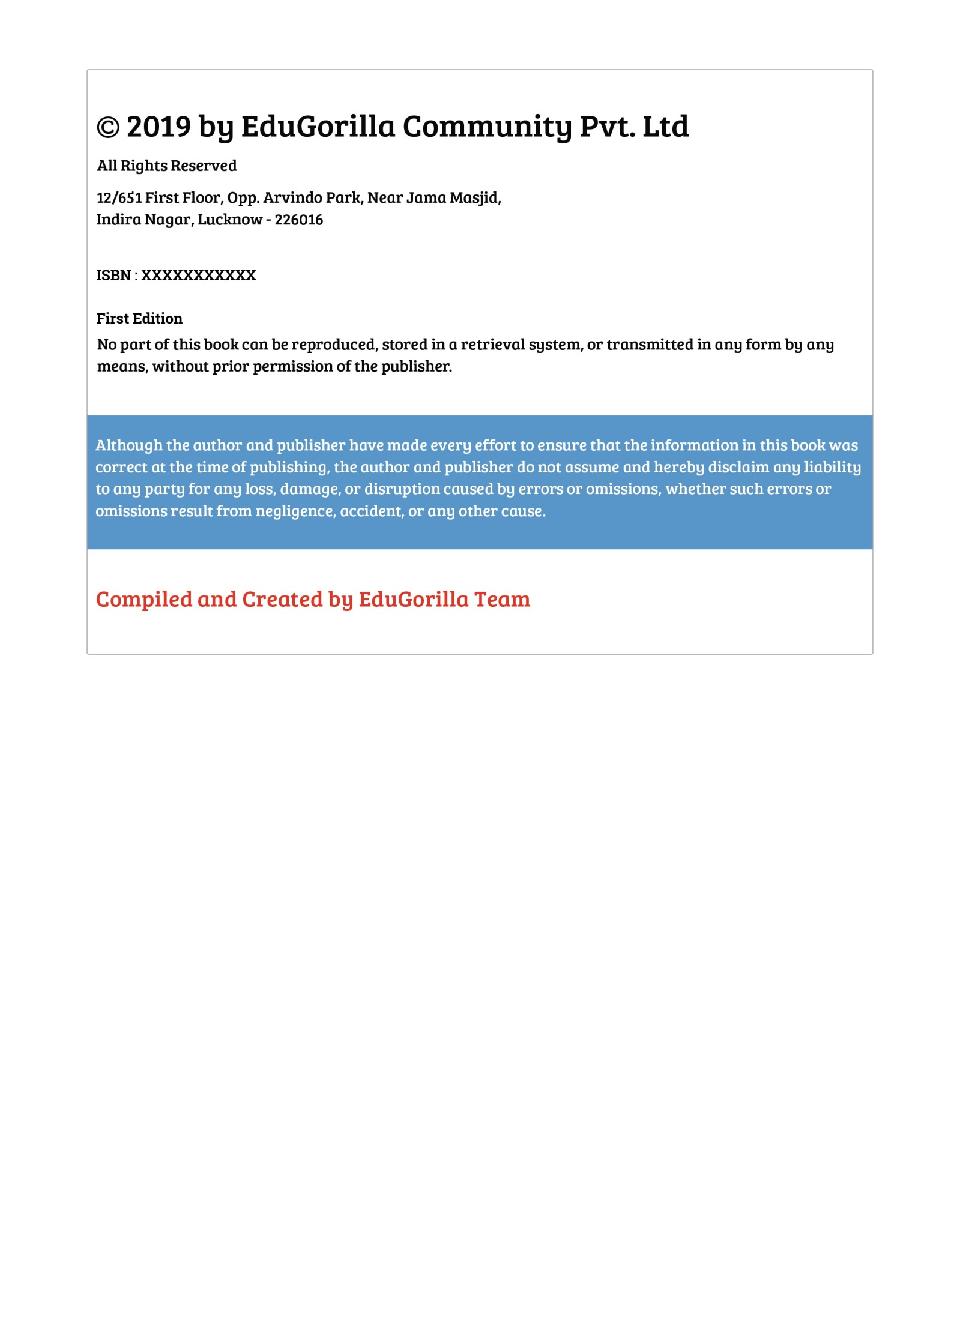 EduGorilla ESIC Upper Division Clerk (UDC) Phase I (Prelims) Recruitment Exam | 10 Mock Test - Page 4